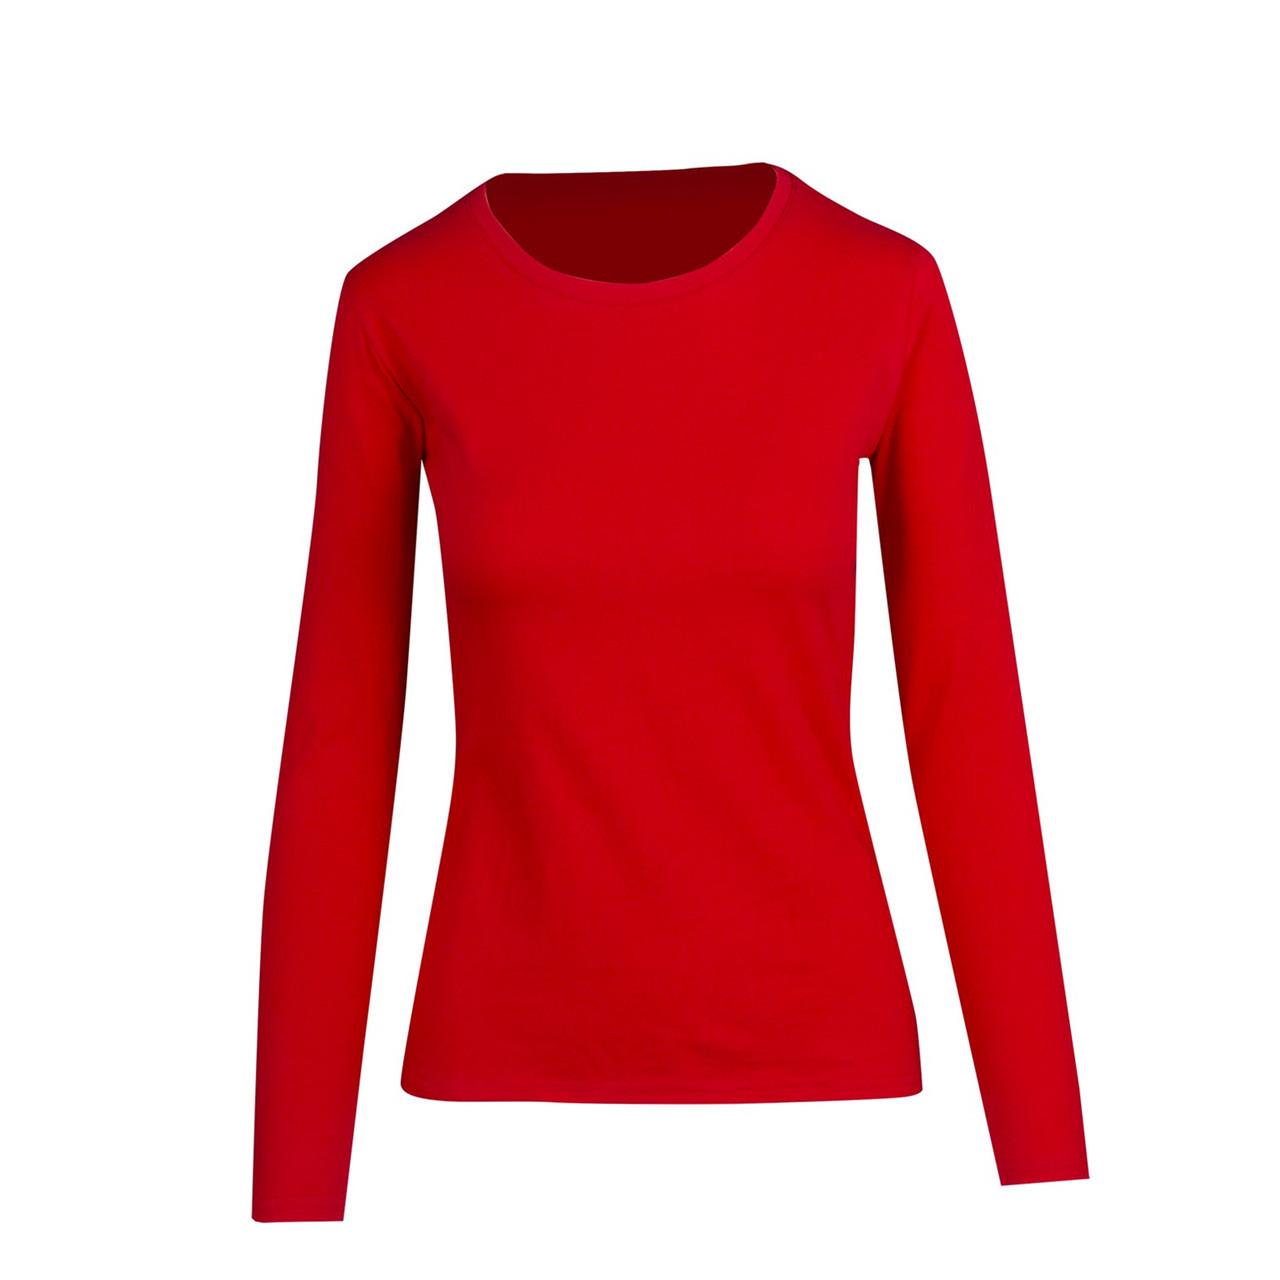 red long sleeve shirt womens